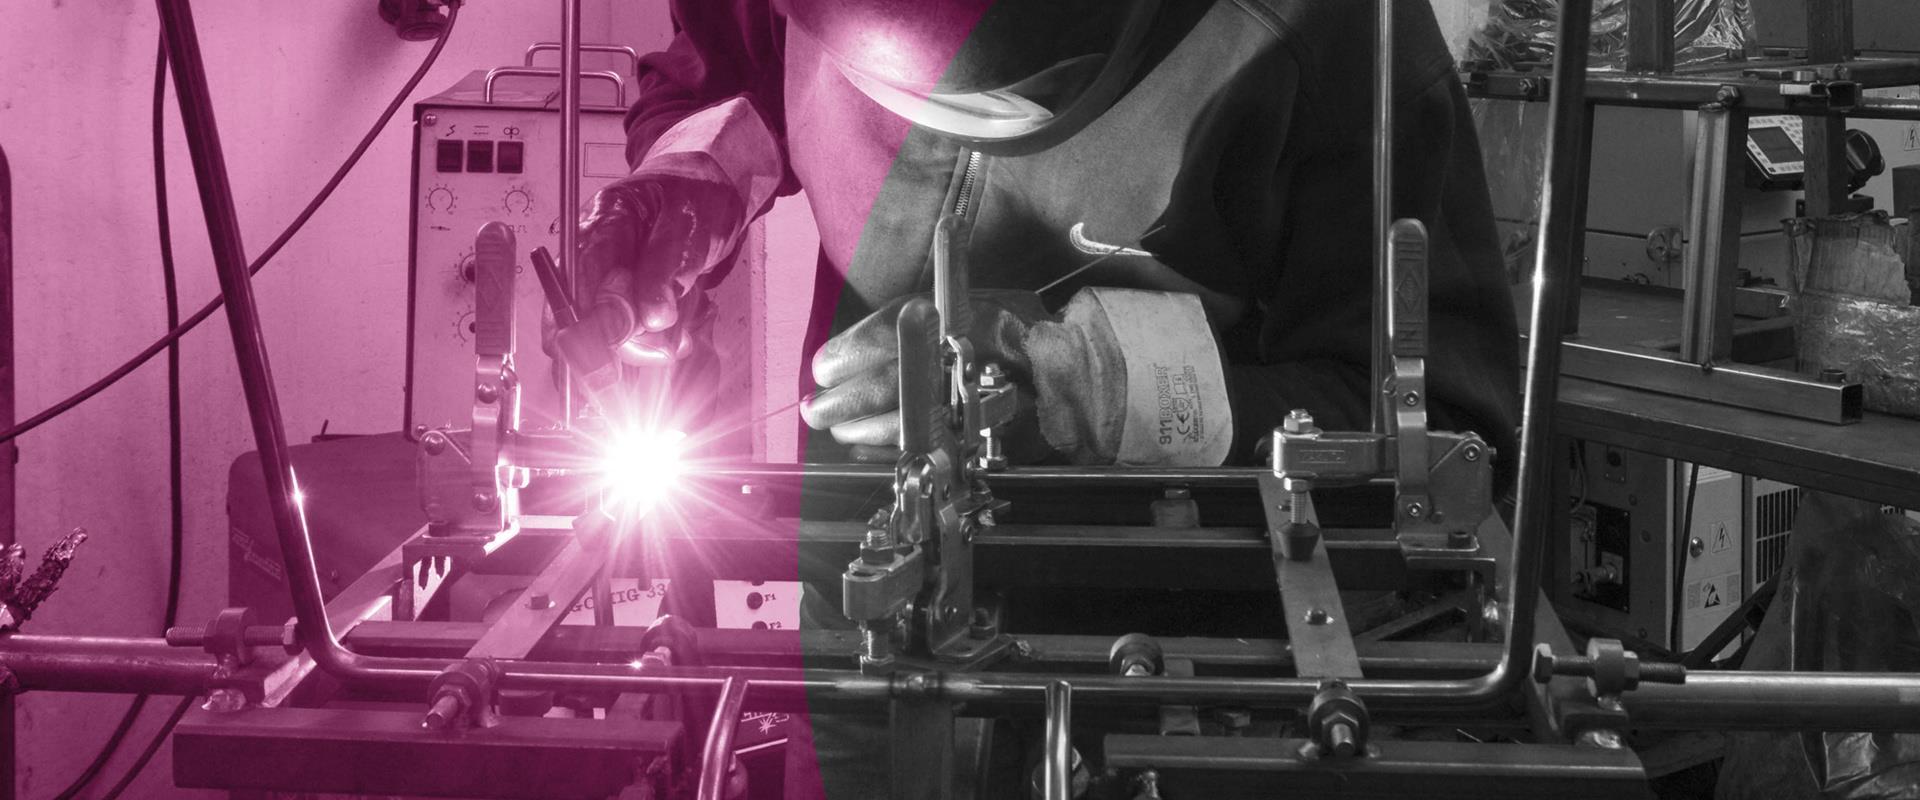 Saldatura manuale tubo in metallo